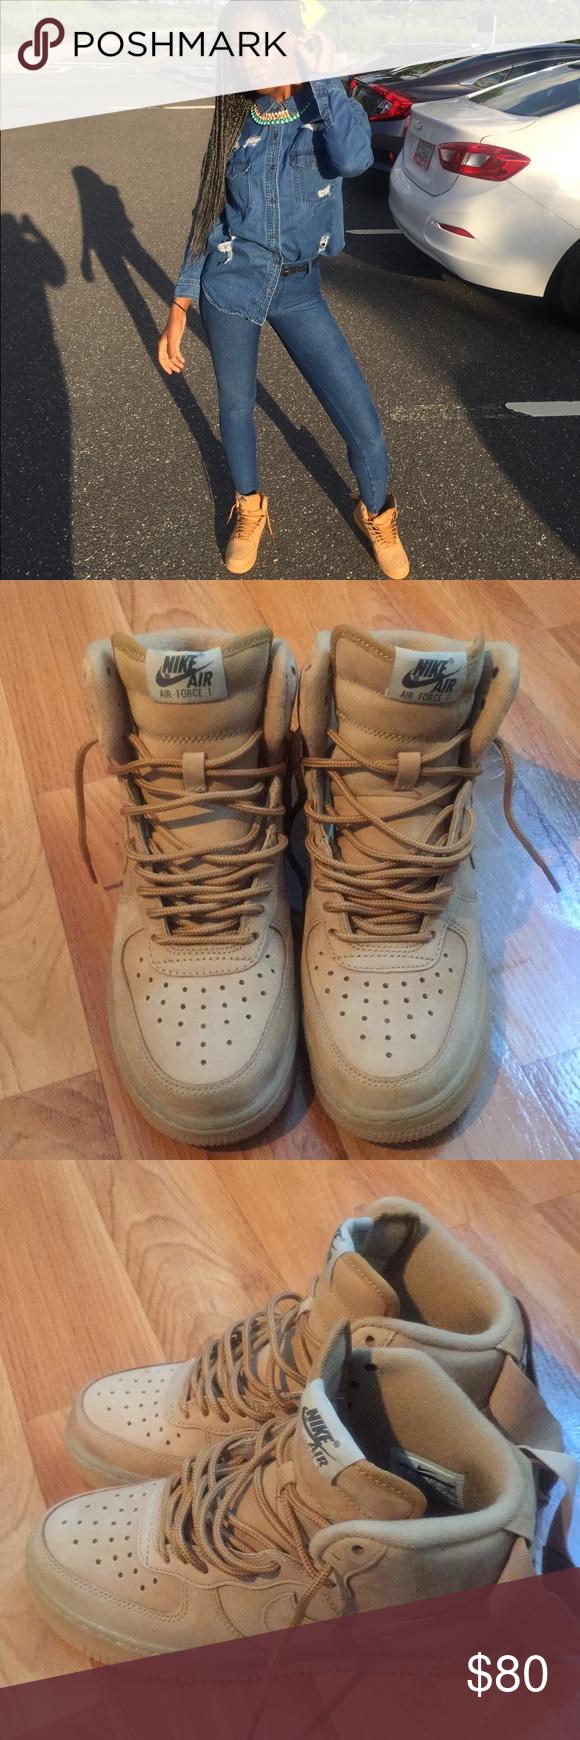 NIKE AIR FORCE 1 LOW WINTER PREMIUM GS WHEAT Nike air force 1 lady's sneakers 943,312 200 beige [228 Shinnyu load]